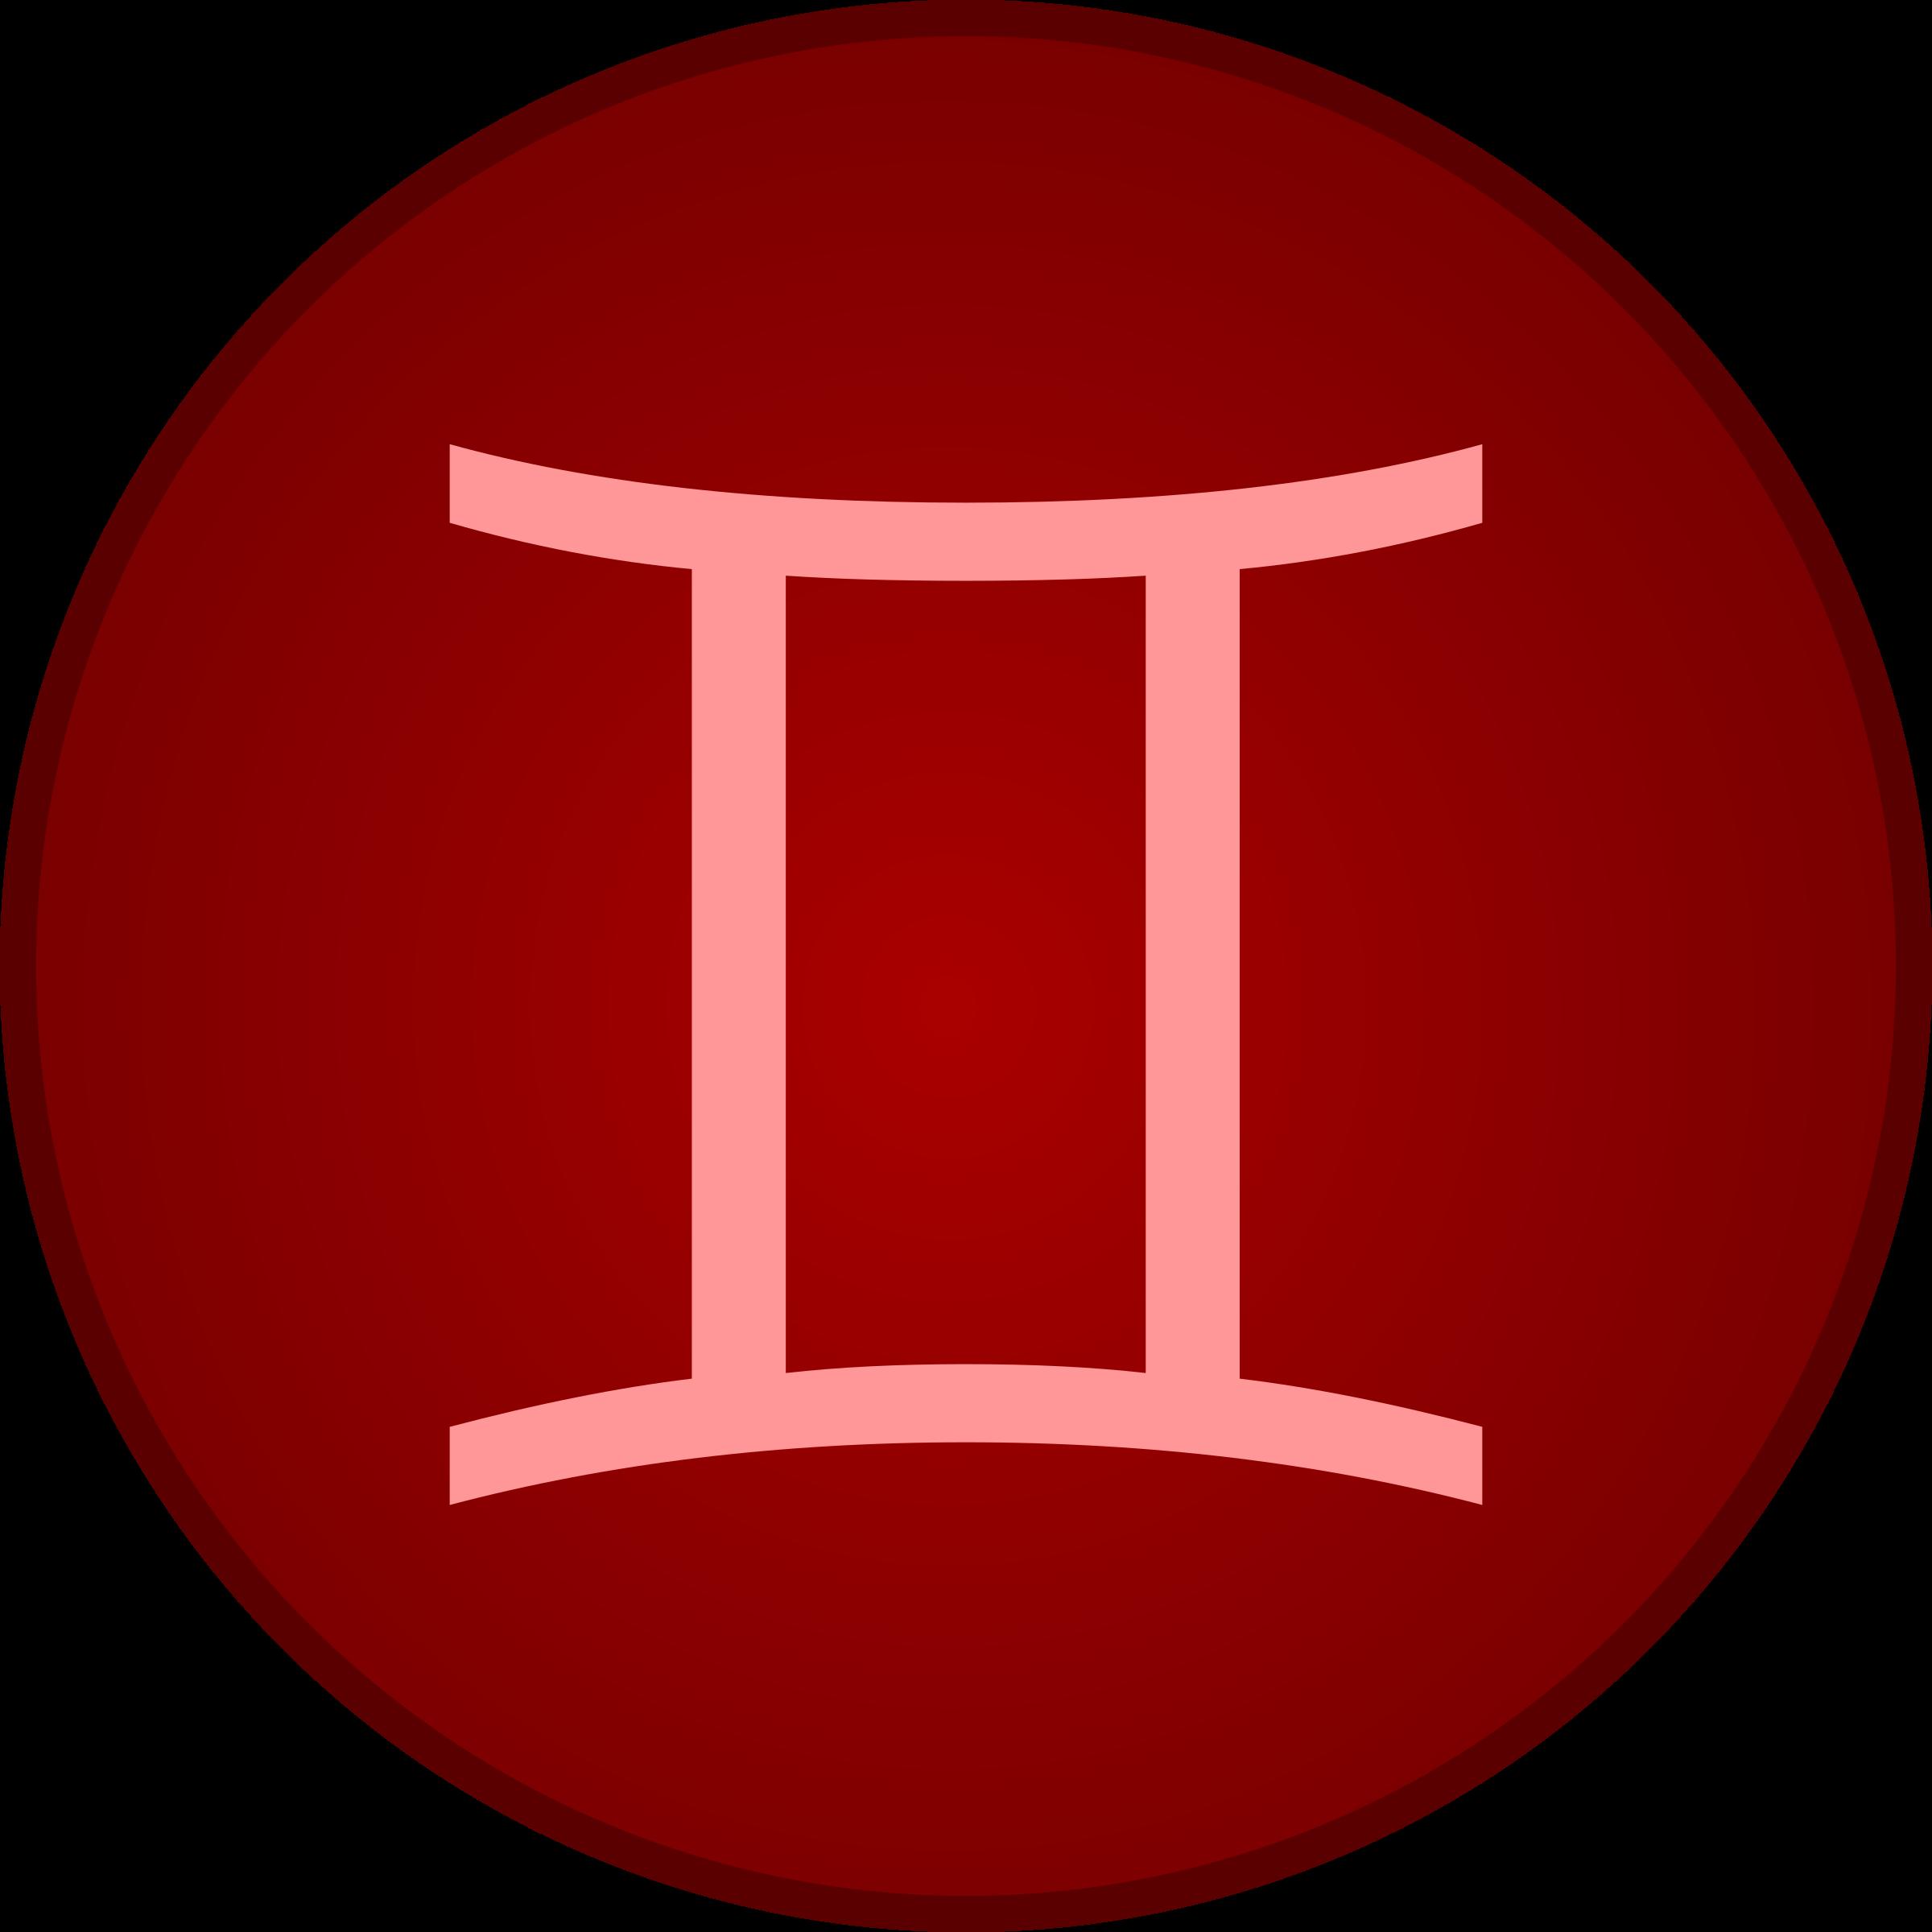 Gemini clipart symbol Clipart symbol symbol Gemini Gemini